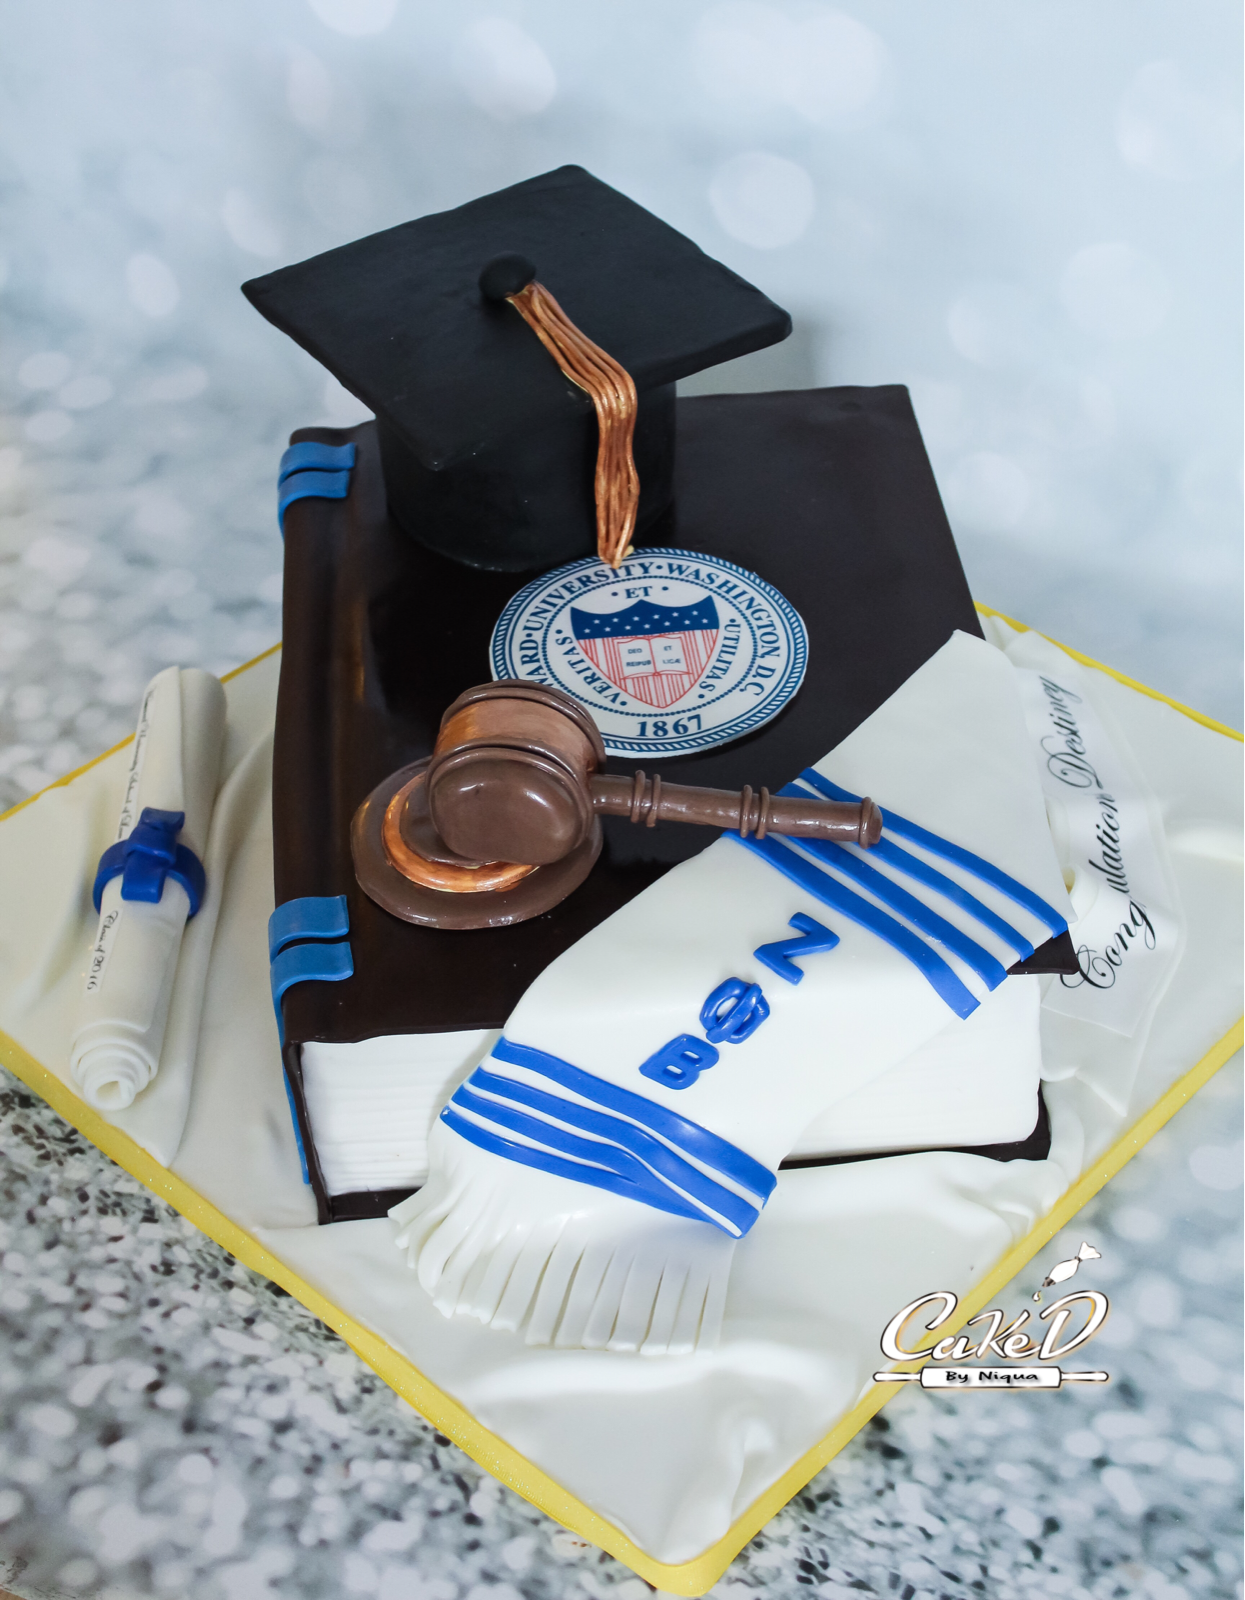 Law School Graduation Book Cake